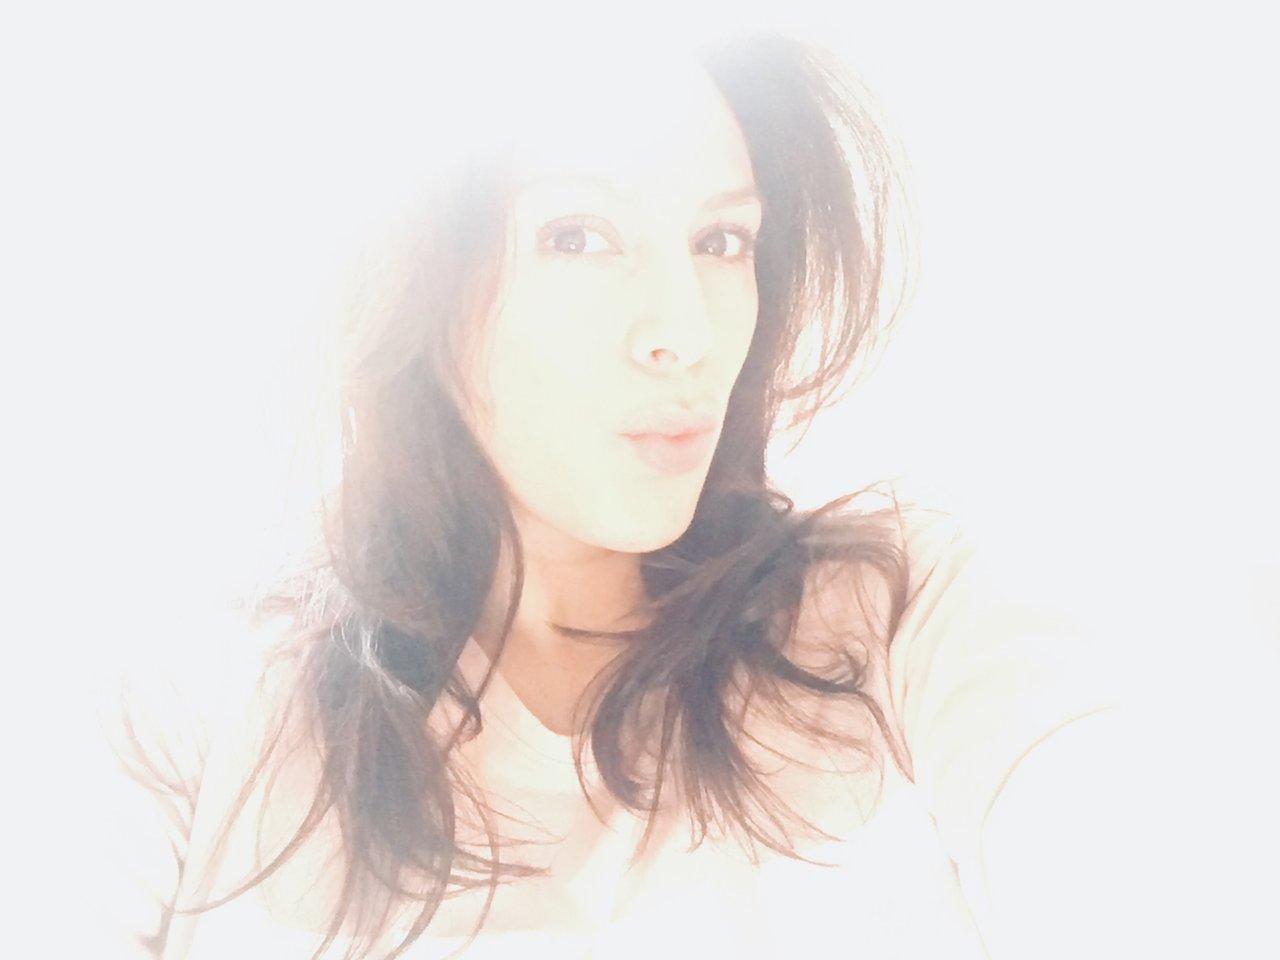 selfie_face_foto